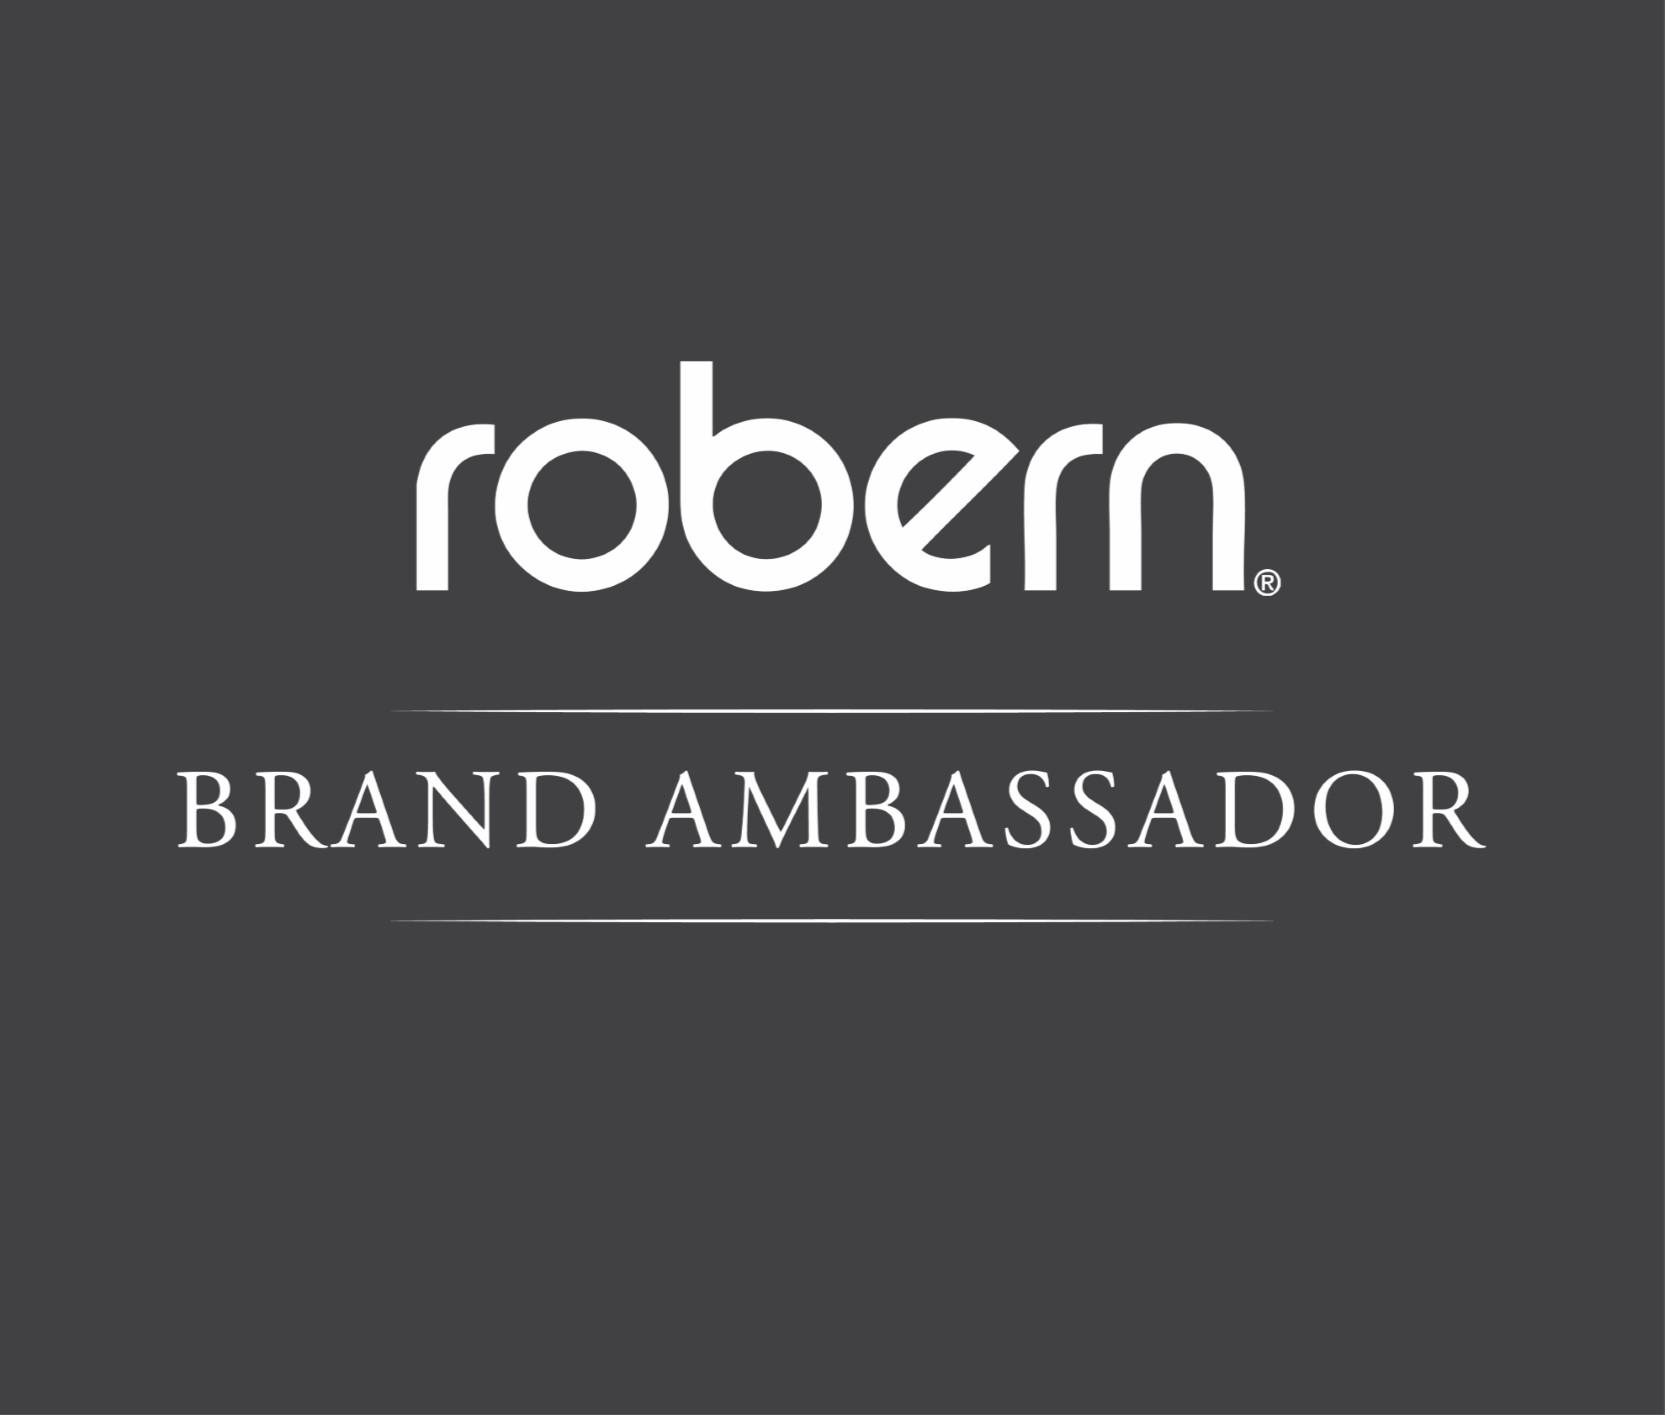 Brand Ambassador Logo_V3_1 dark final low-res.jpg